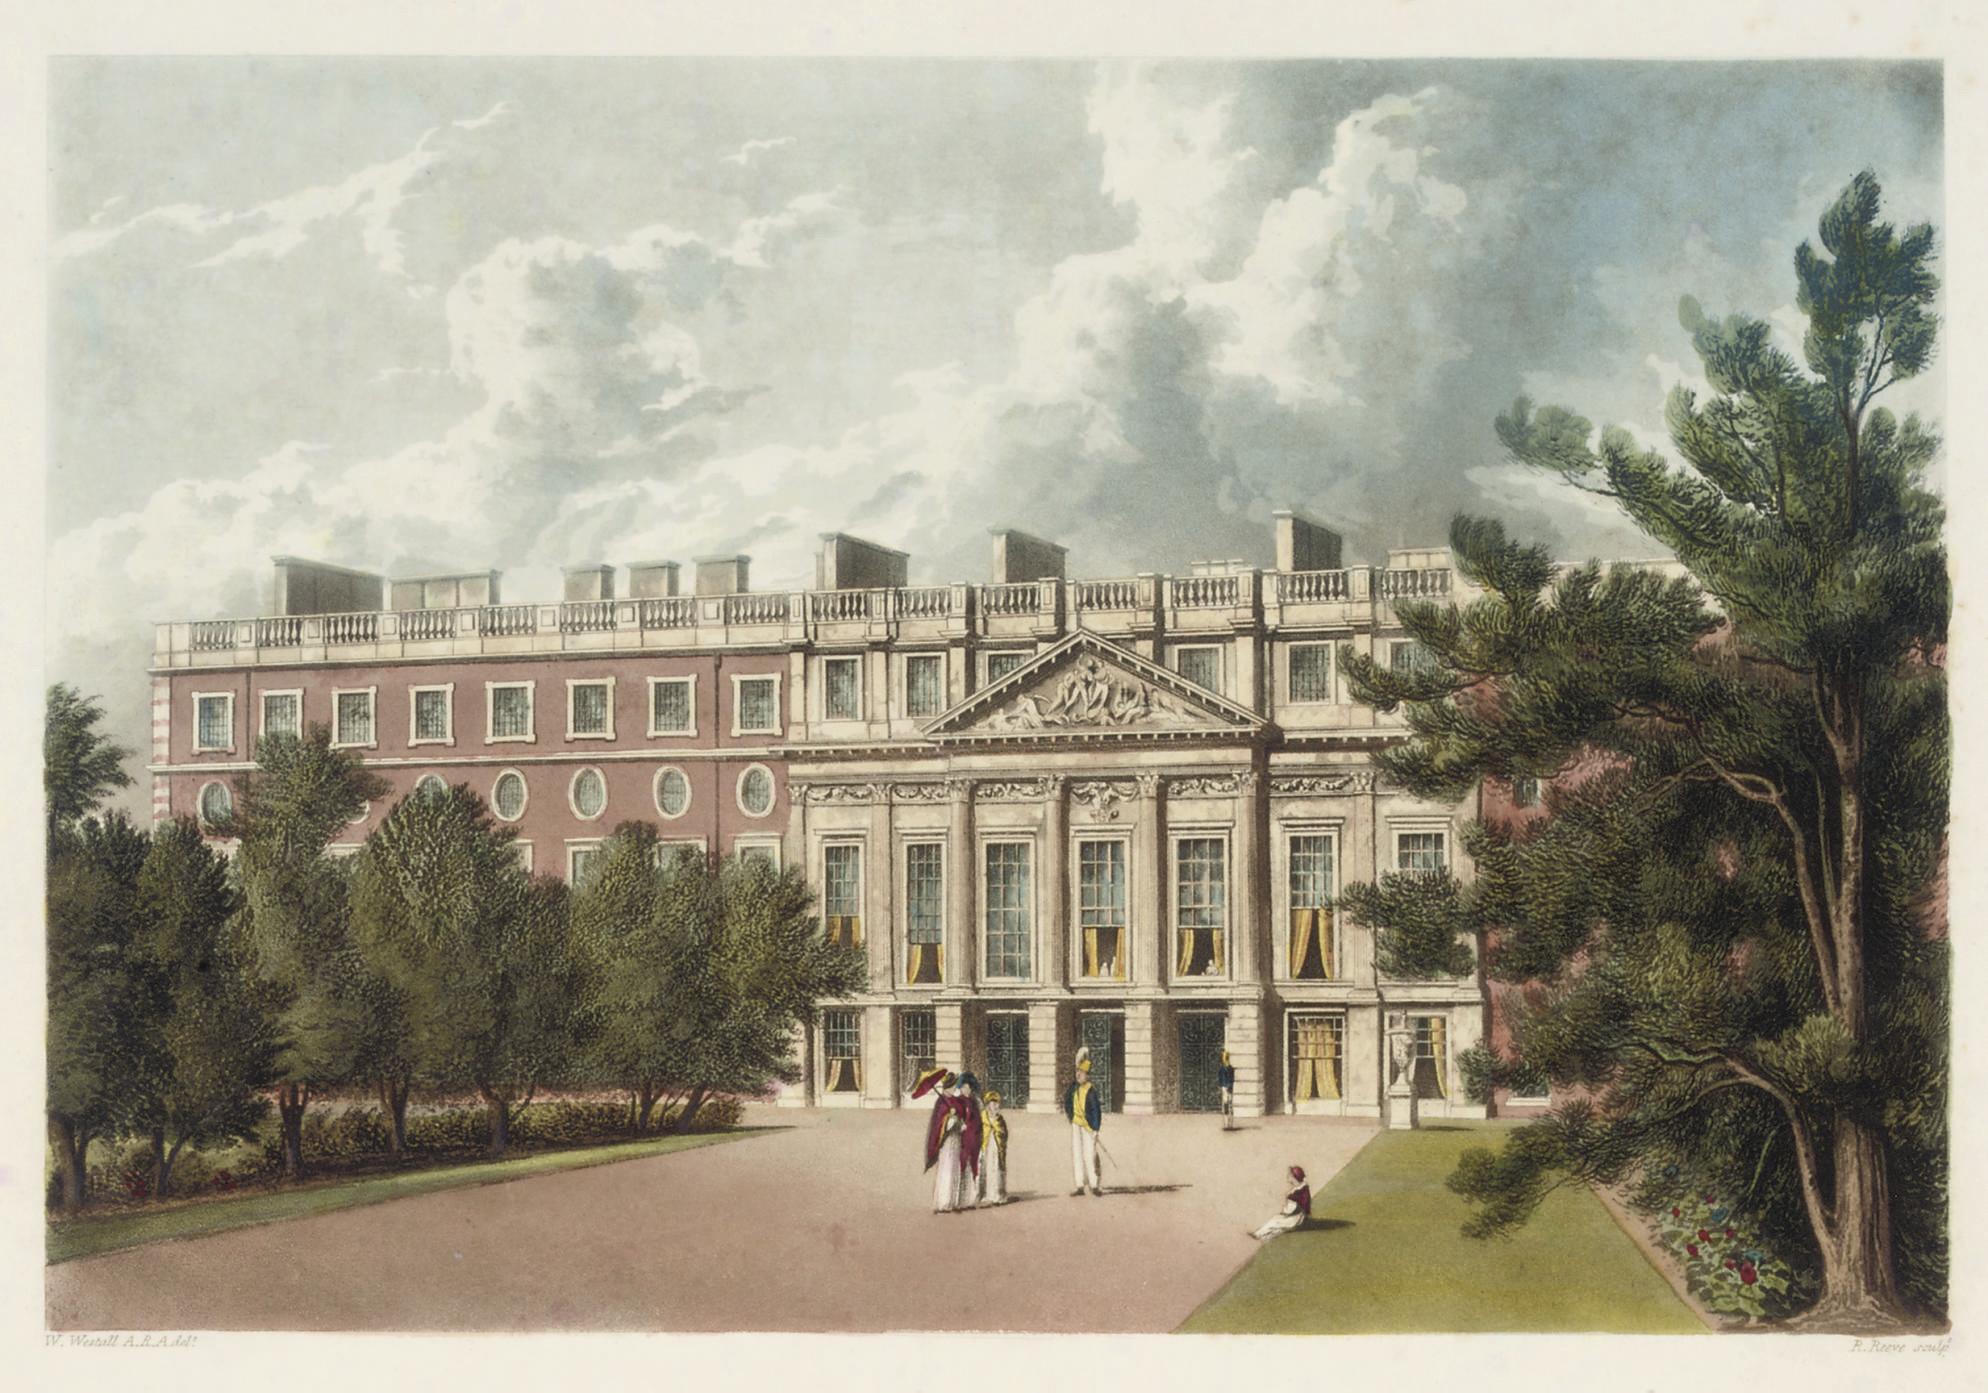 PYNE, William Henry (1769-1843